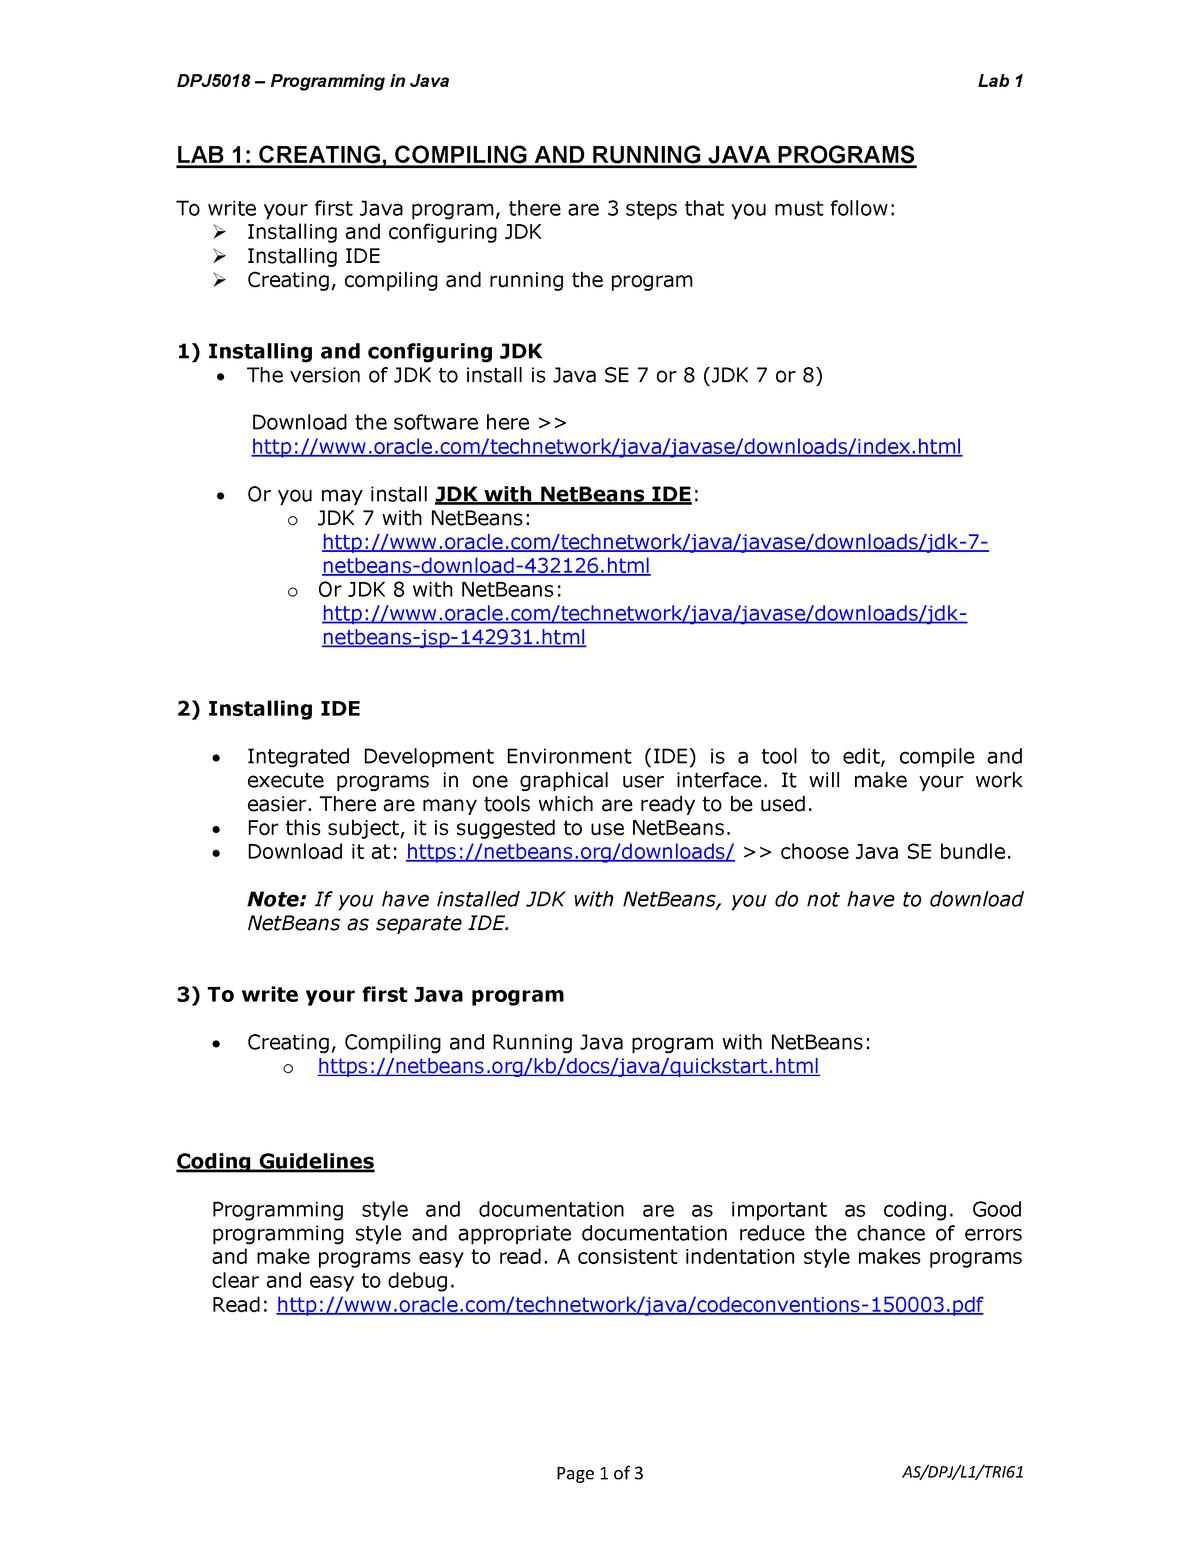 48871 LAB 1 - Tutorial - Programming in Java - StuDocu